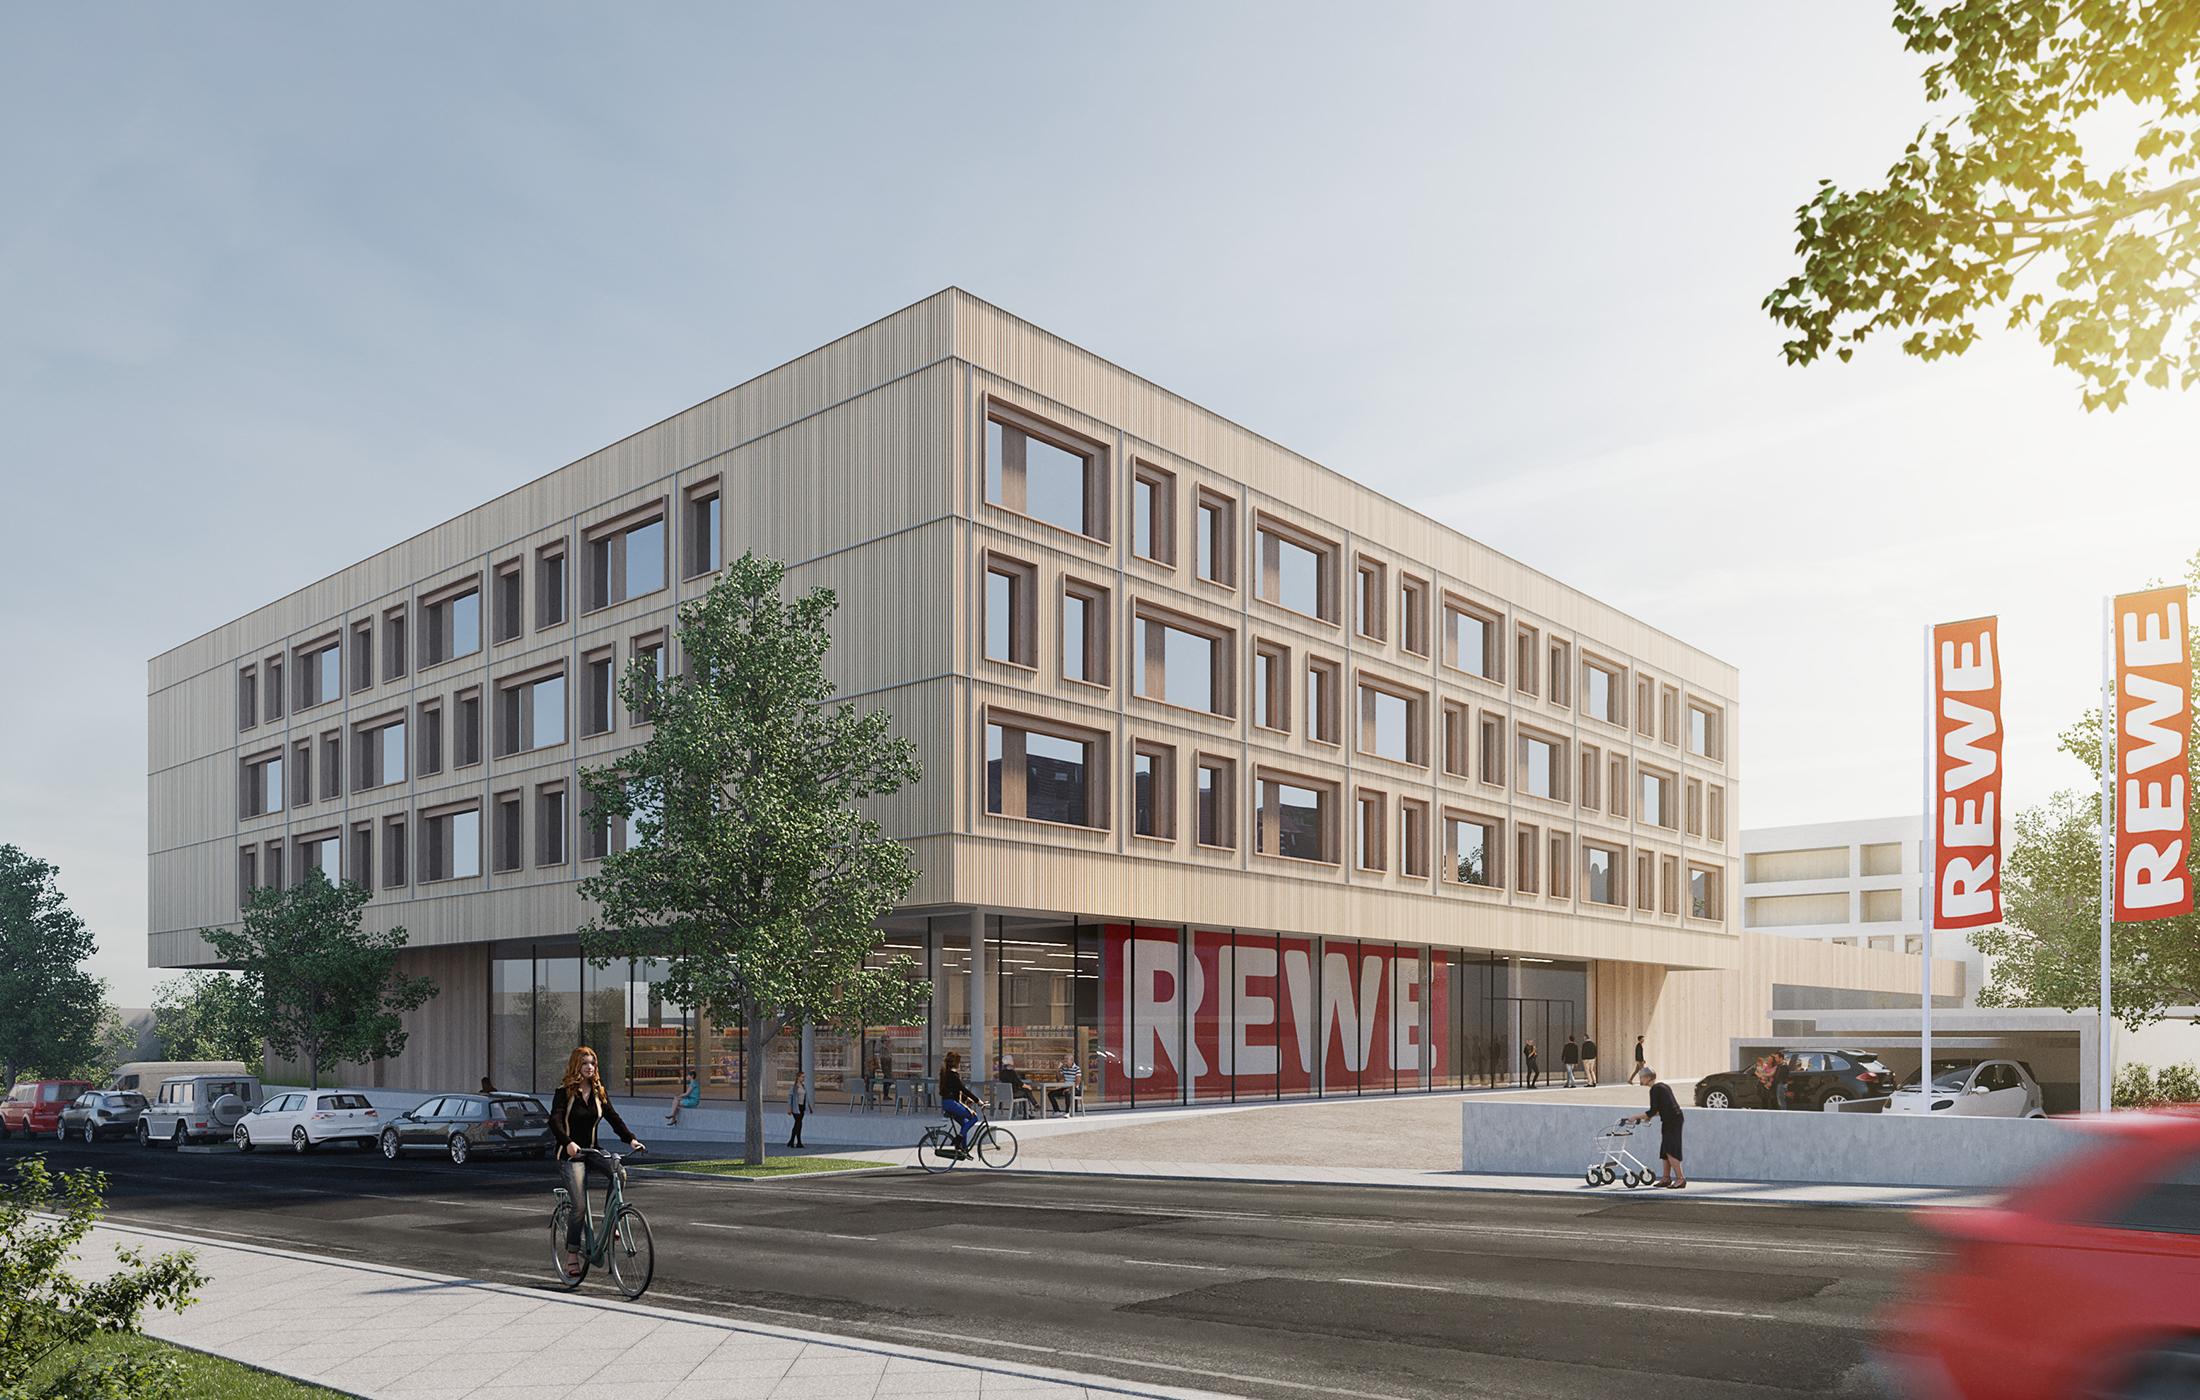 2019, Quartier Metzstraße, Stuttgart